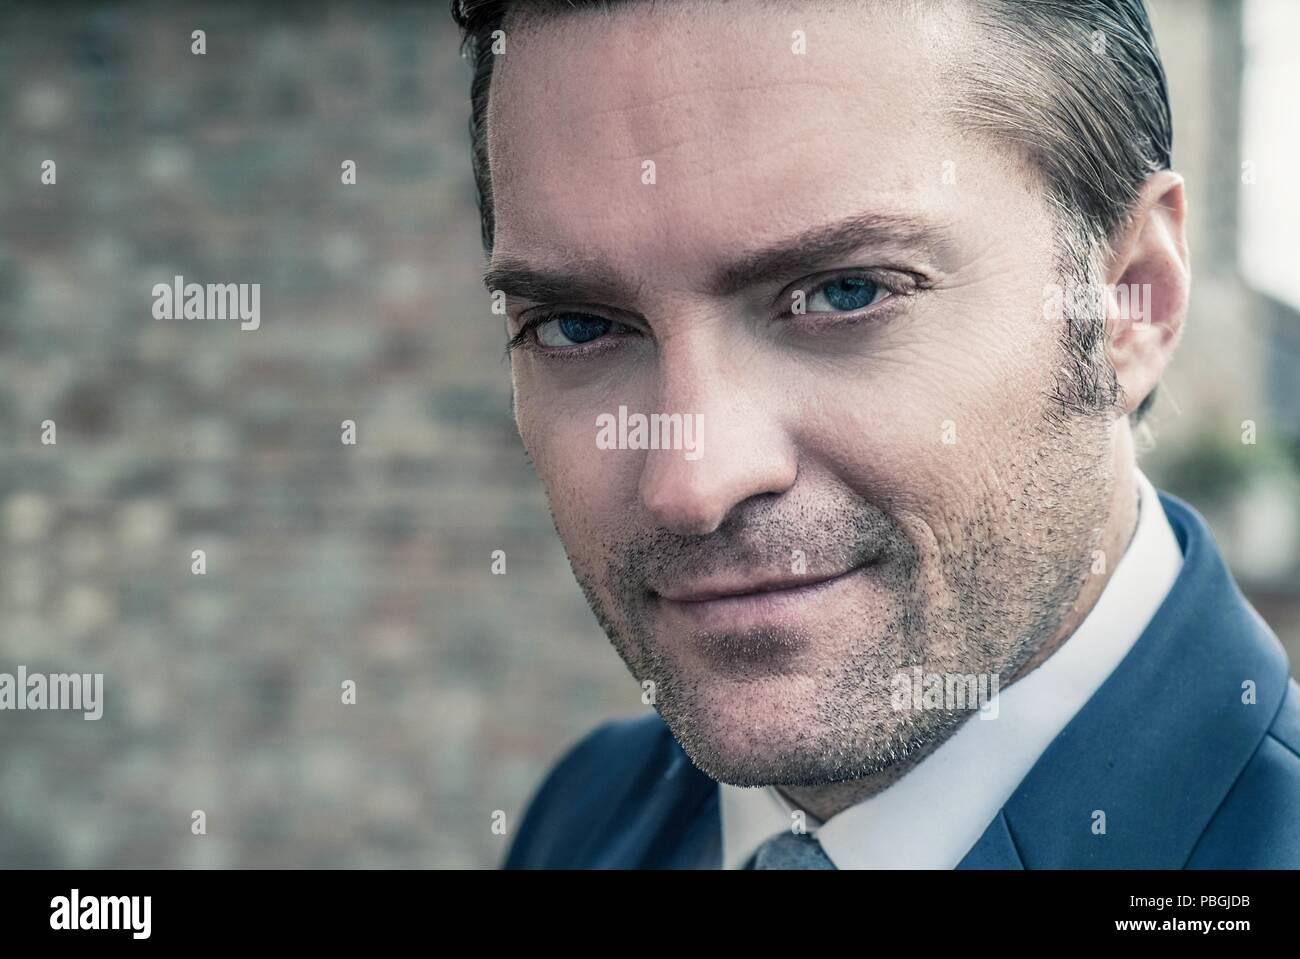 closeup portrait of a handsome man in a smart suit Stock Photo